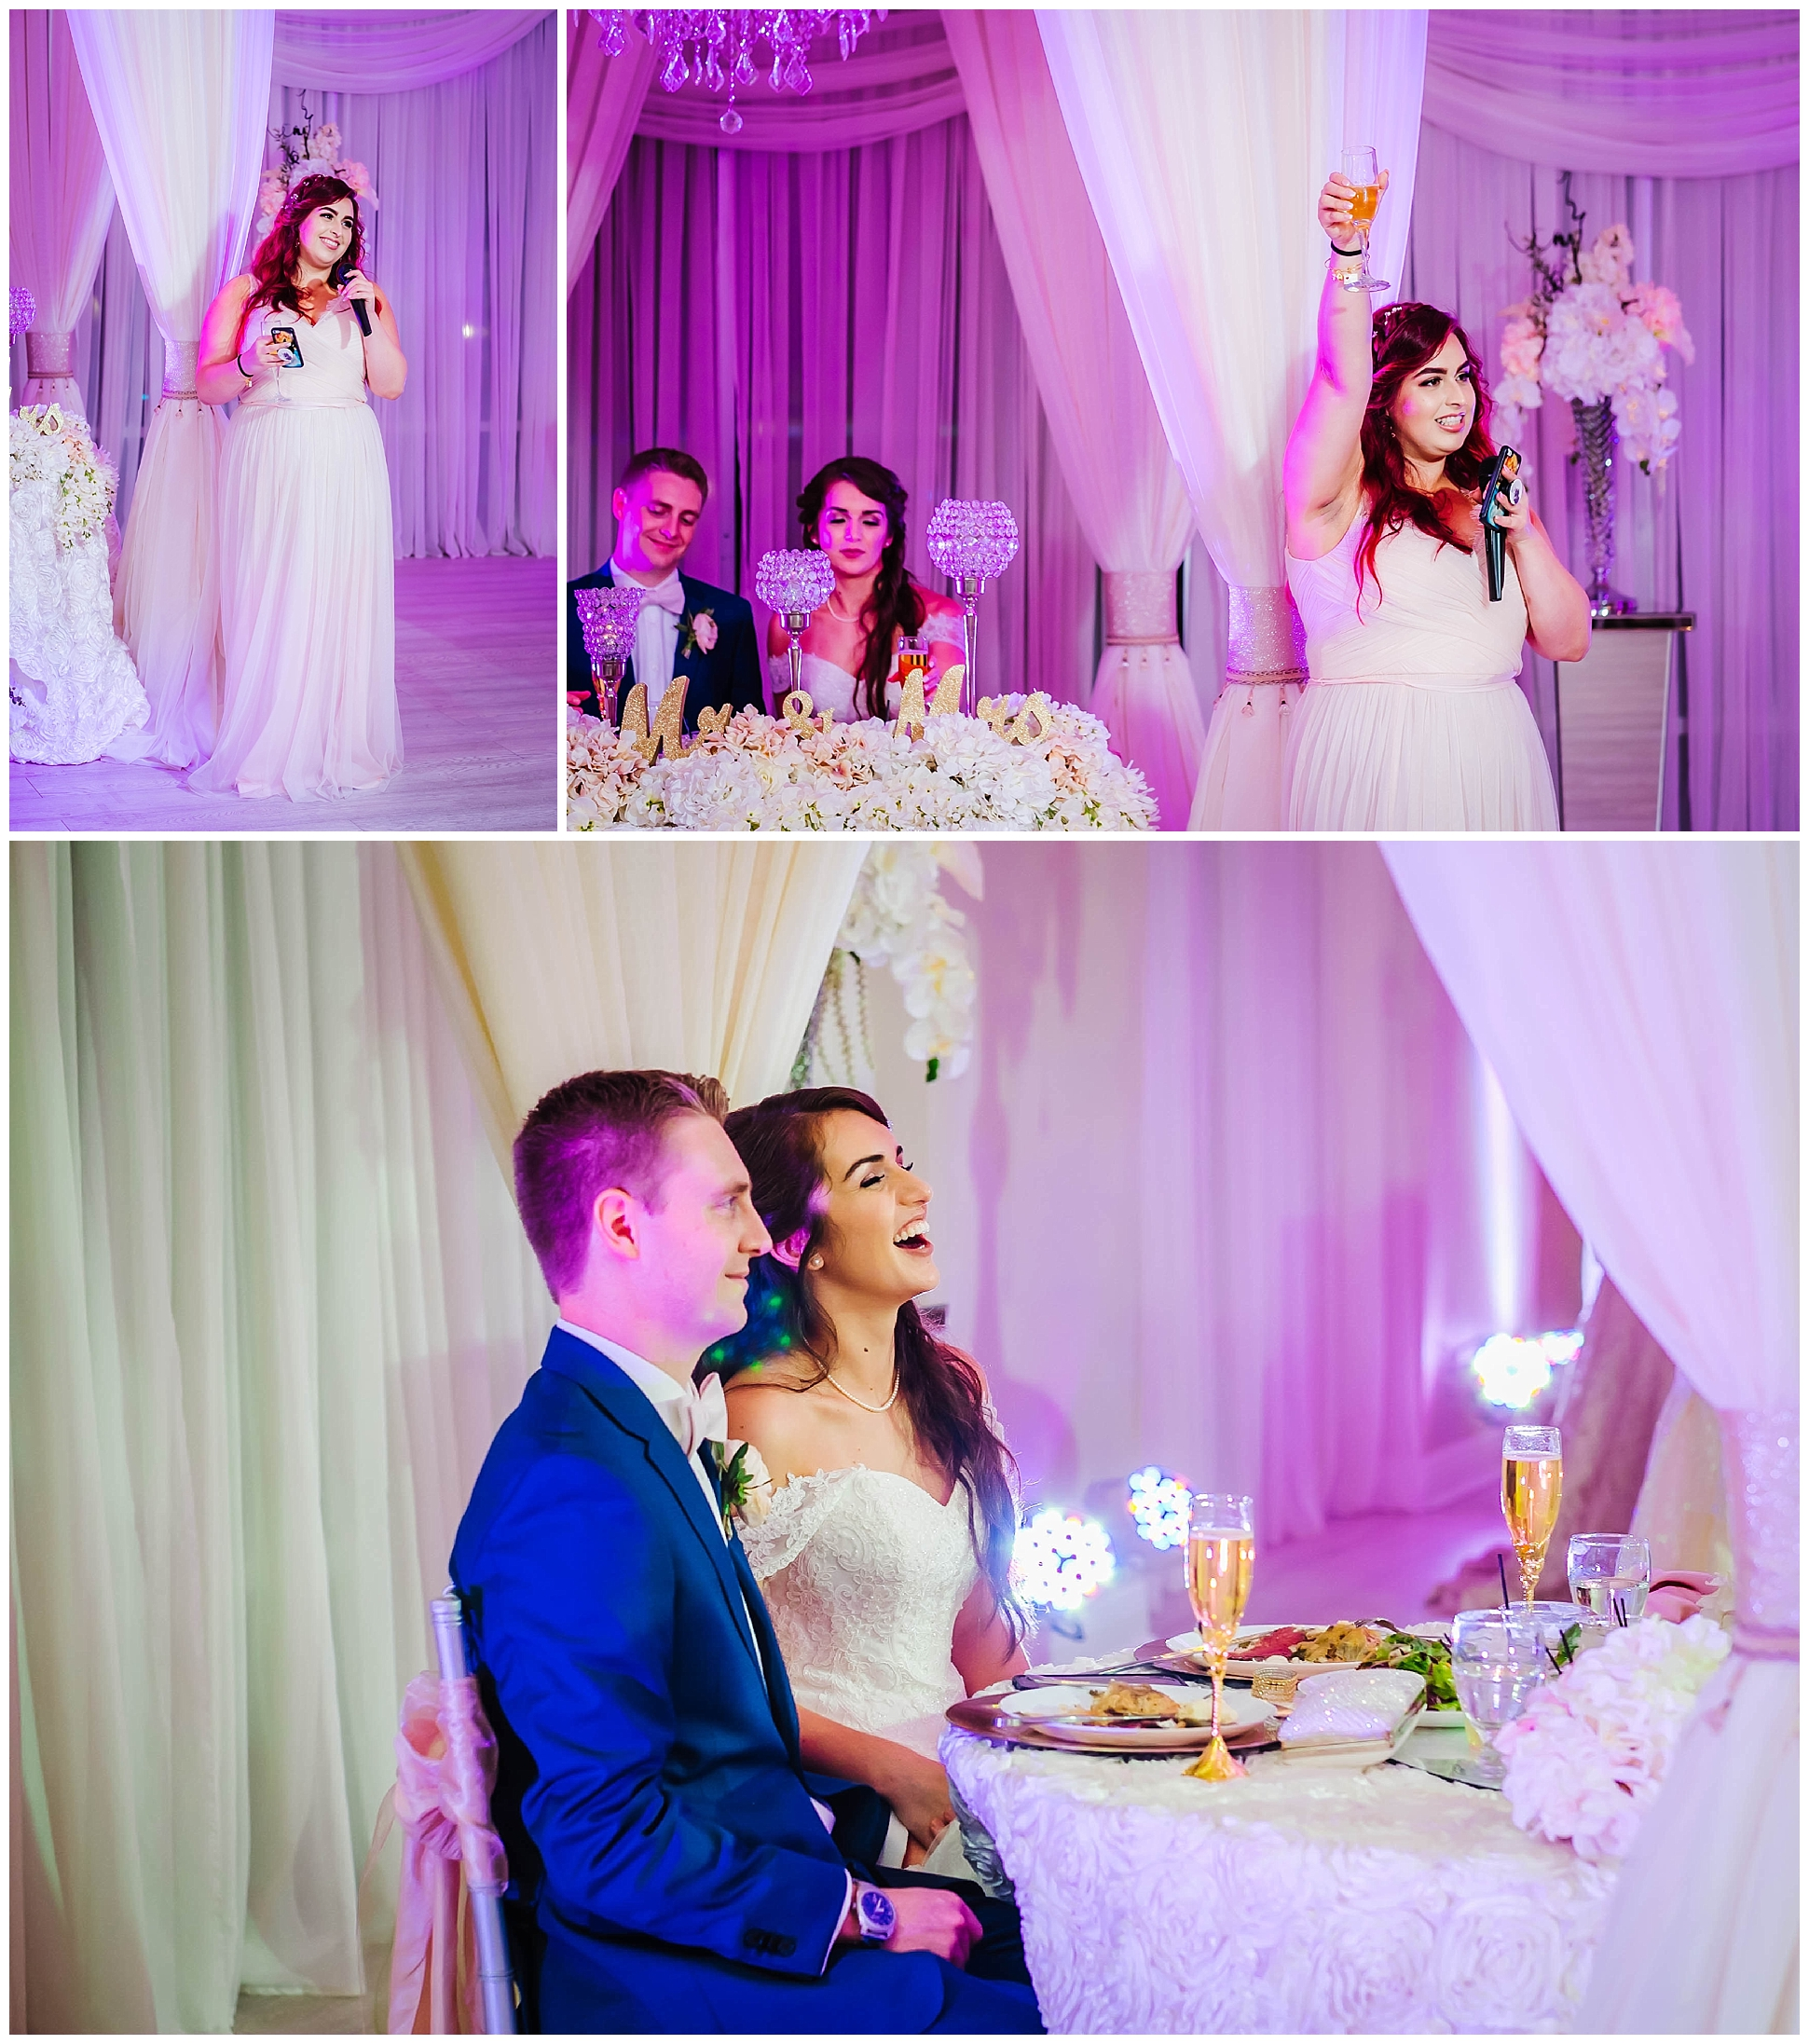 st-pete-wedding-photographer-sunken-gardens-crystal-ballroom-princess-dancer_0191.jpg